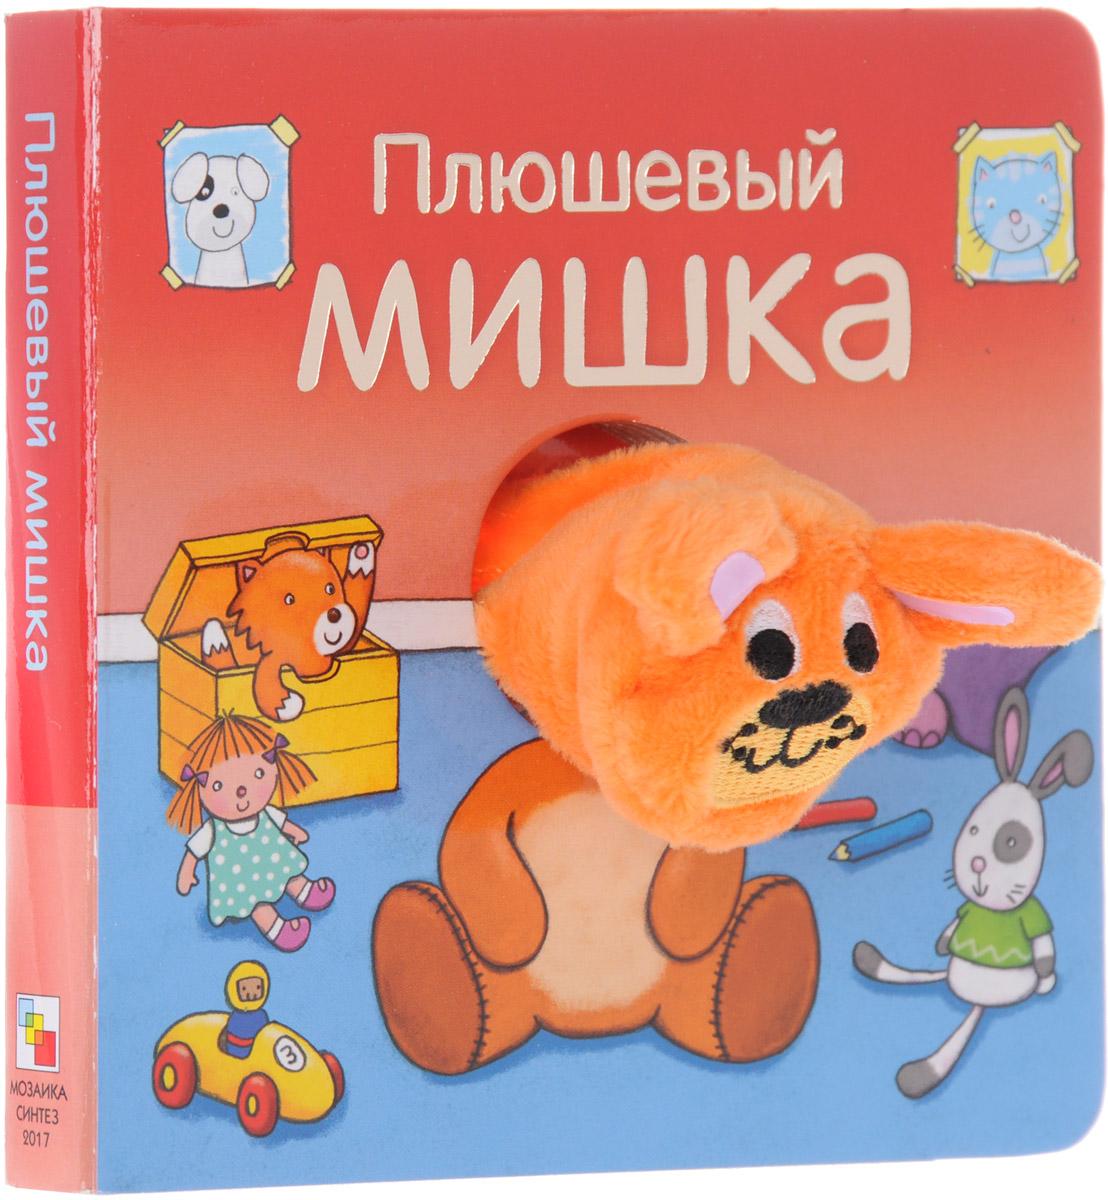 О. Мозалева Плюшевый мишка. Книжка-игрушка